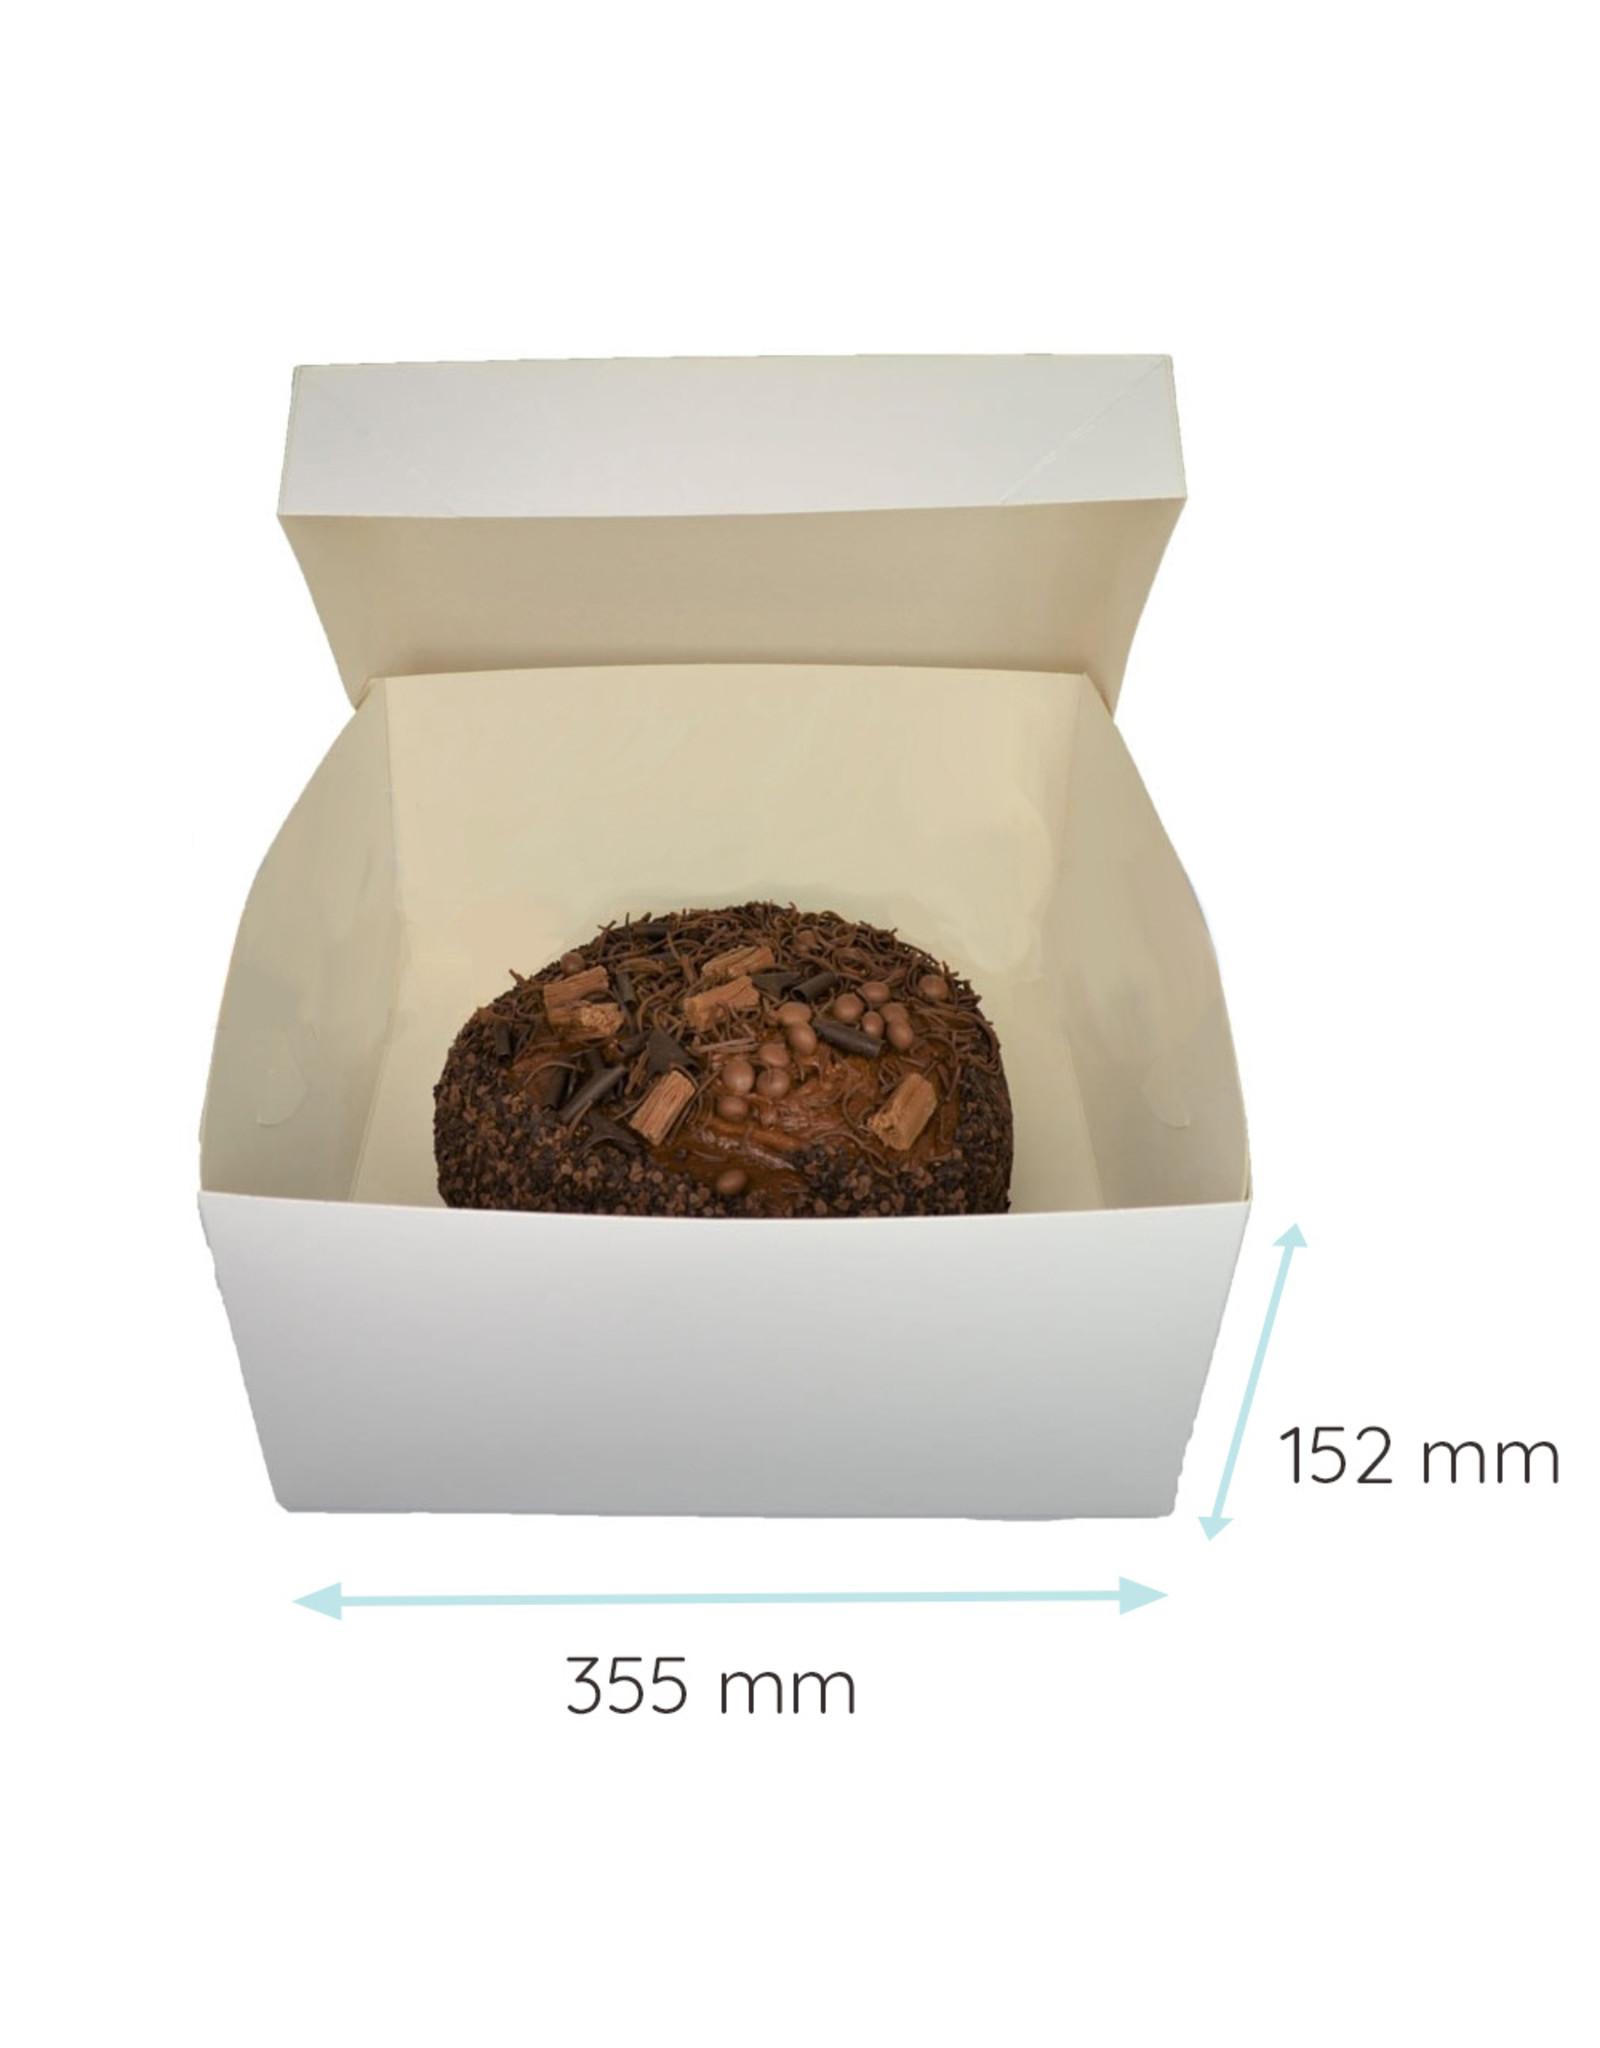 Folding 2 piece cakebox - 35 x 35 x 15 cm (50 pieces)